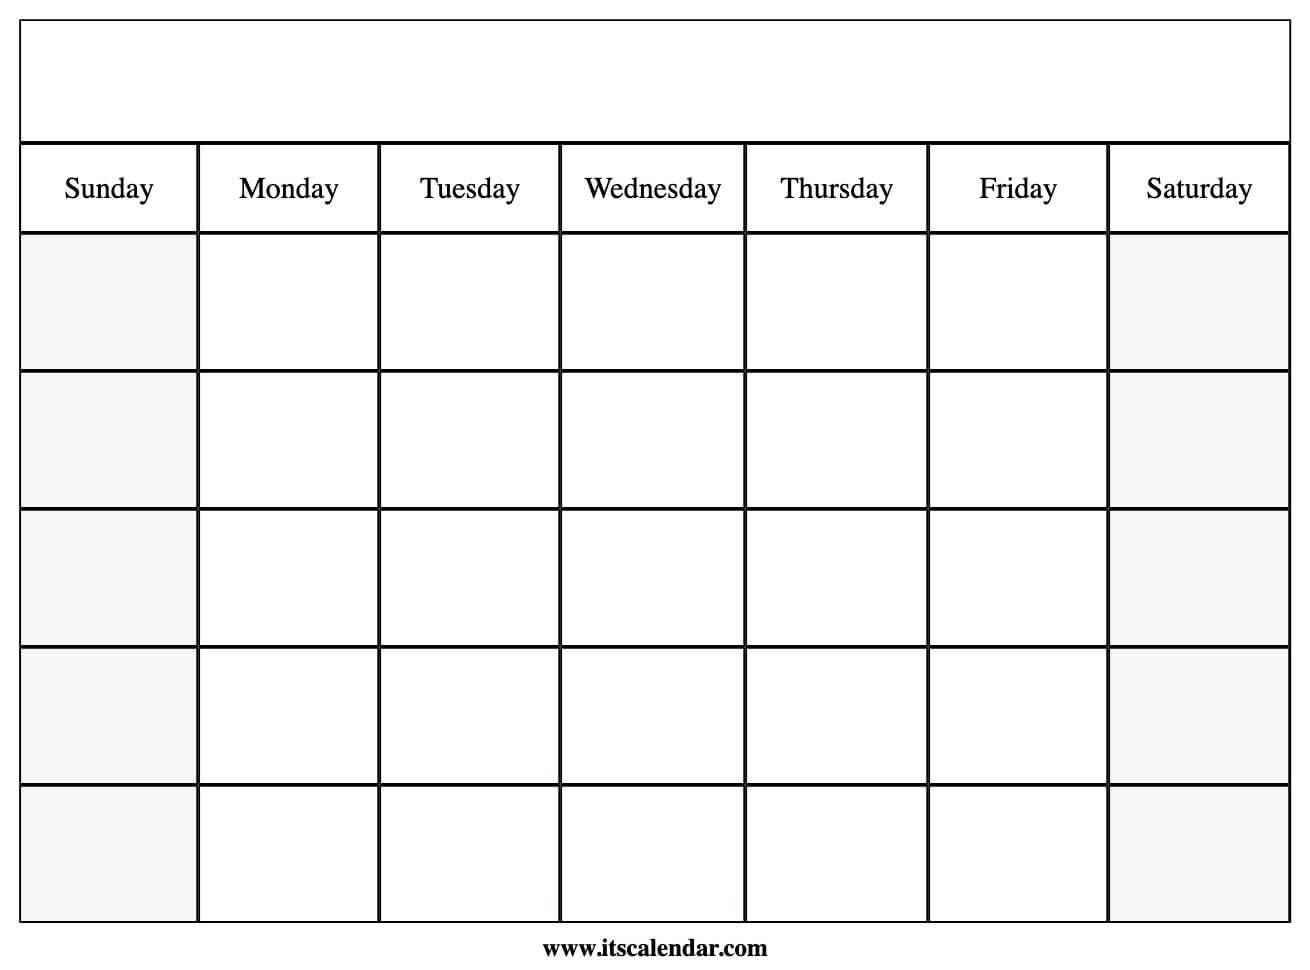 Printable Blank Calendar intended for Blank Calander Template